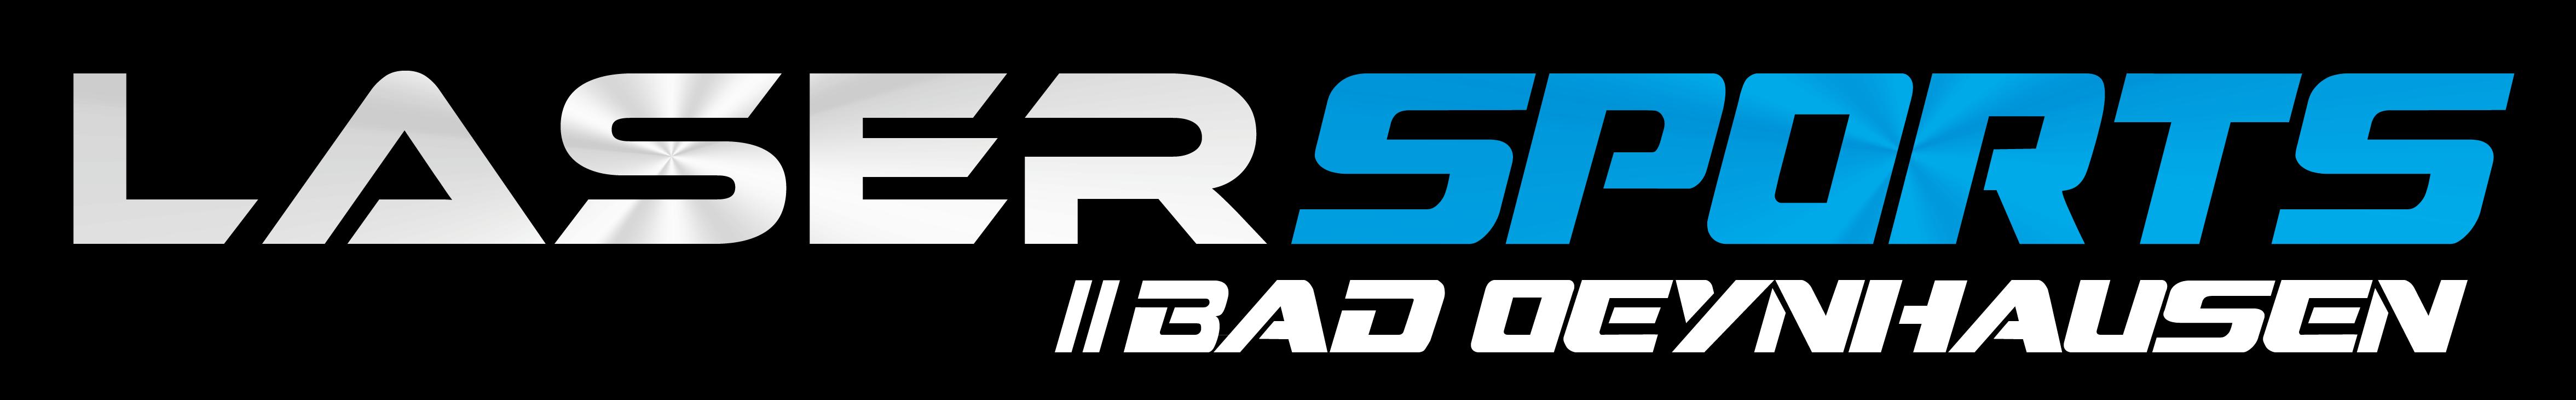 Laser Sports Bad Oeynhausen